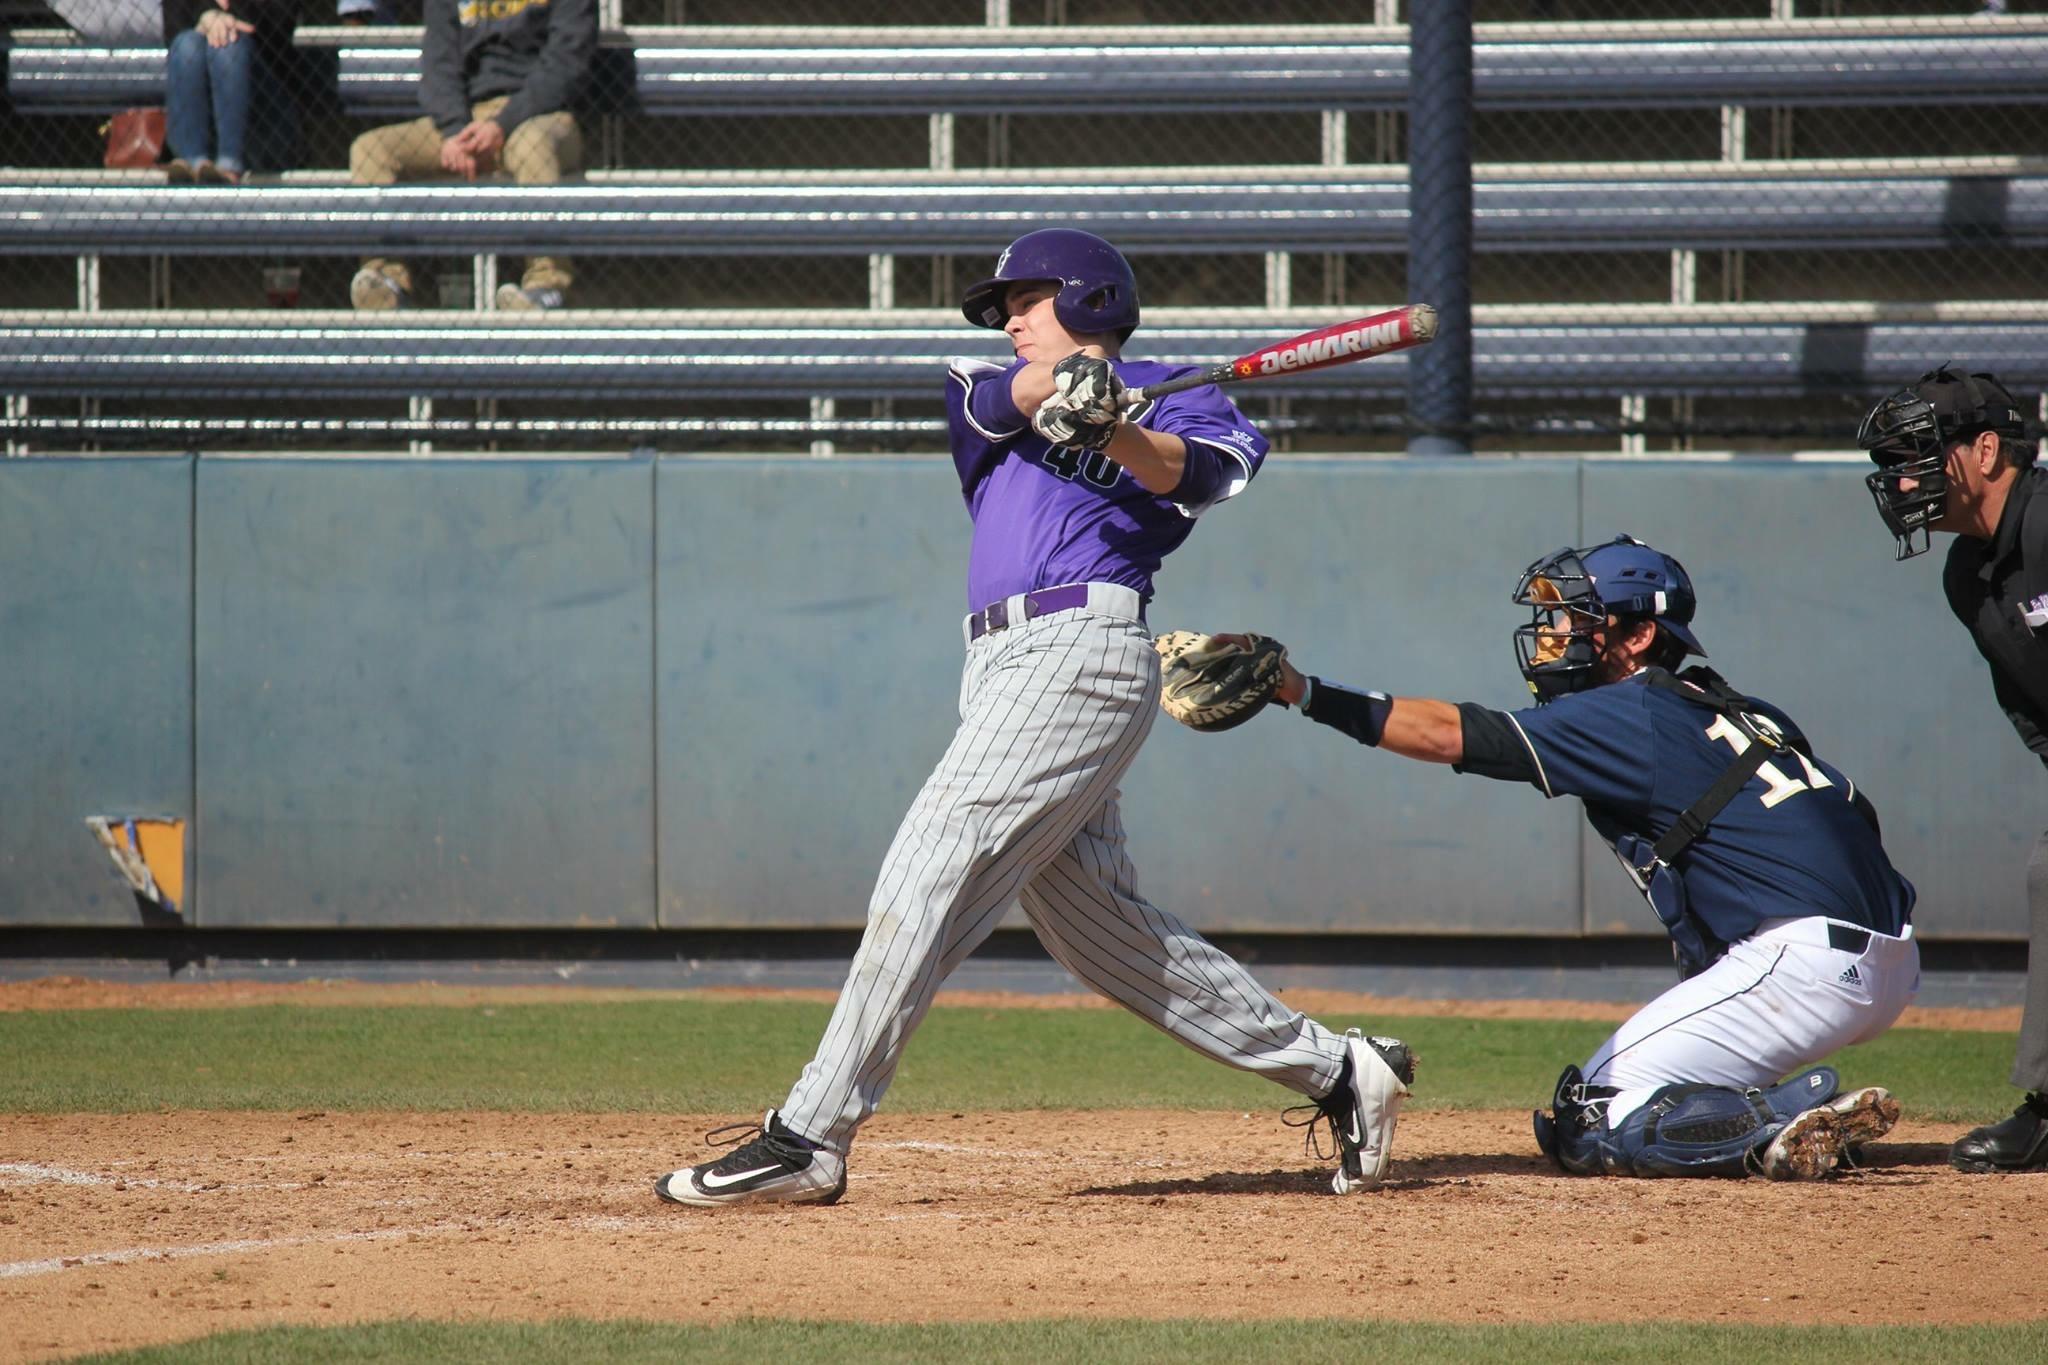 Baseball Offseason   Increase lean body mass, rotational power and velocity.   Learn More